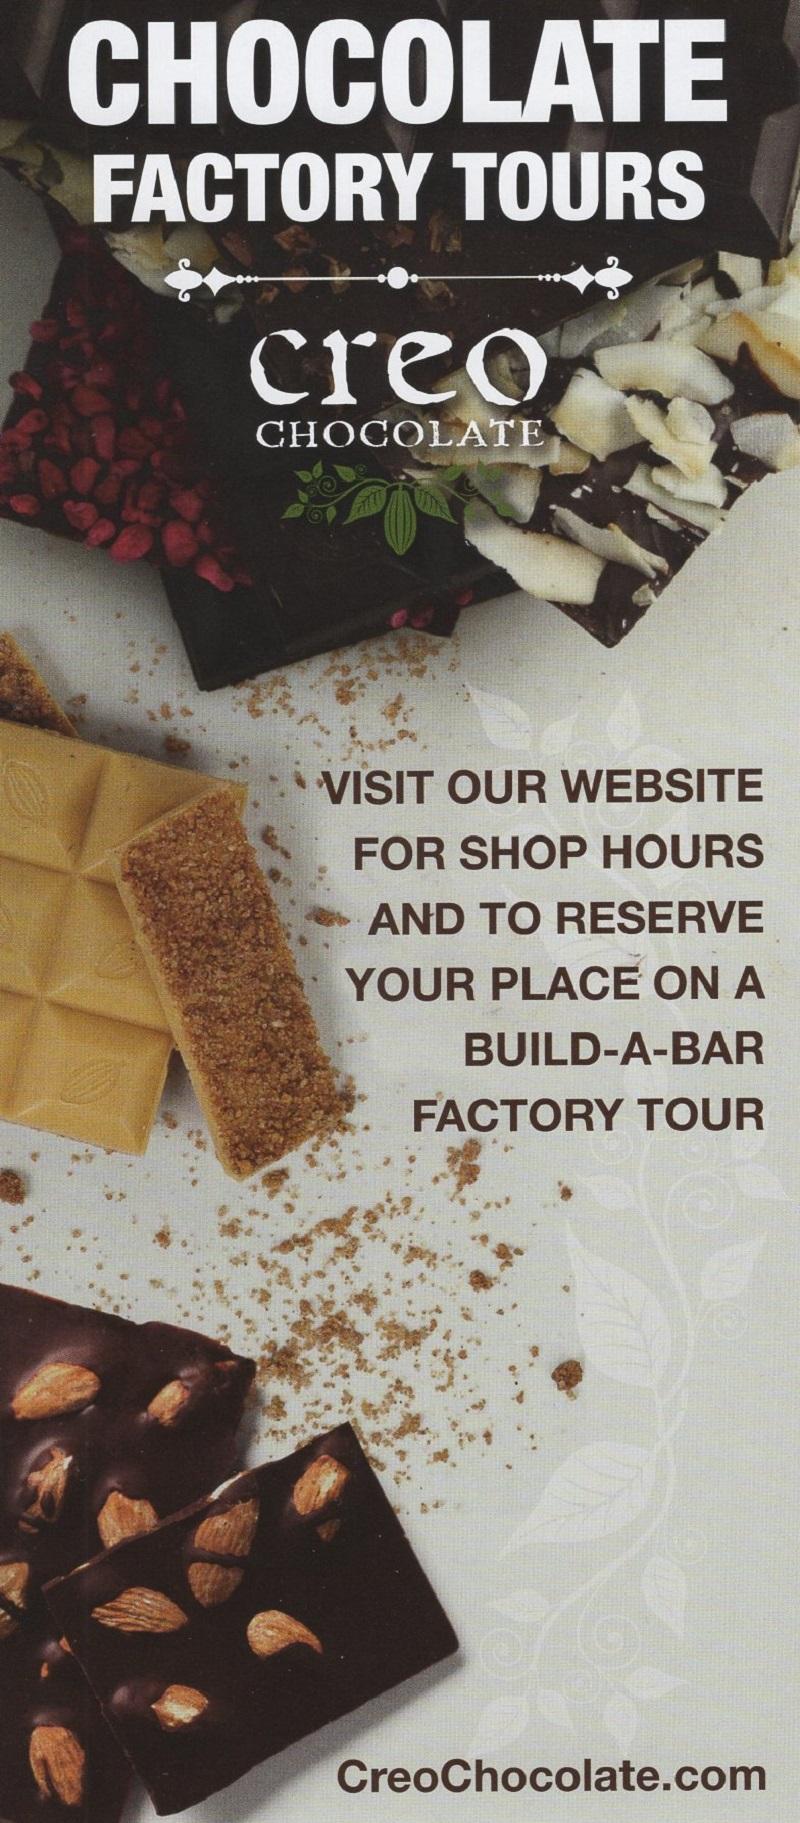 Creo Chocolate Factory Tours